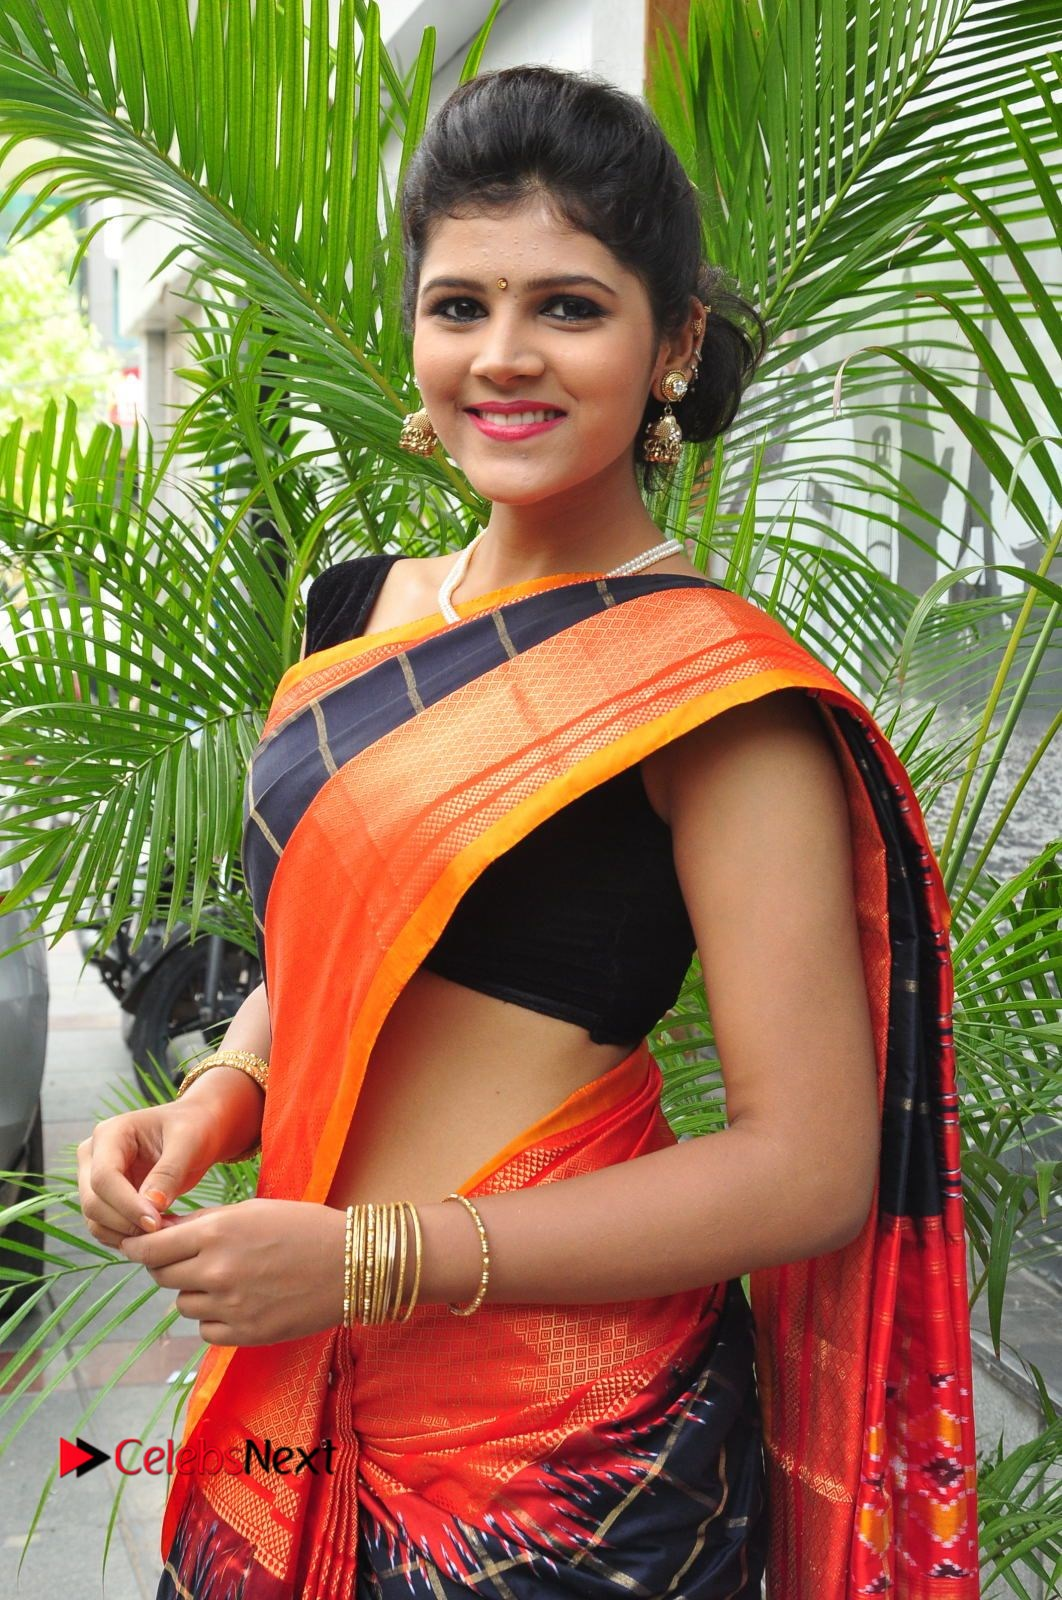 Model Sangeeta Kamath Pictures in Saree at Silk India Expo Curtain Raiser  0020.JPG